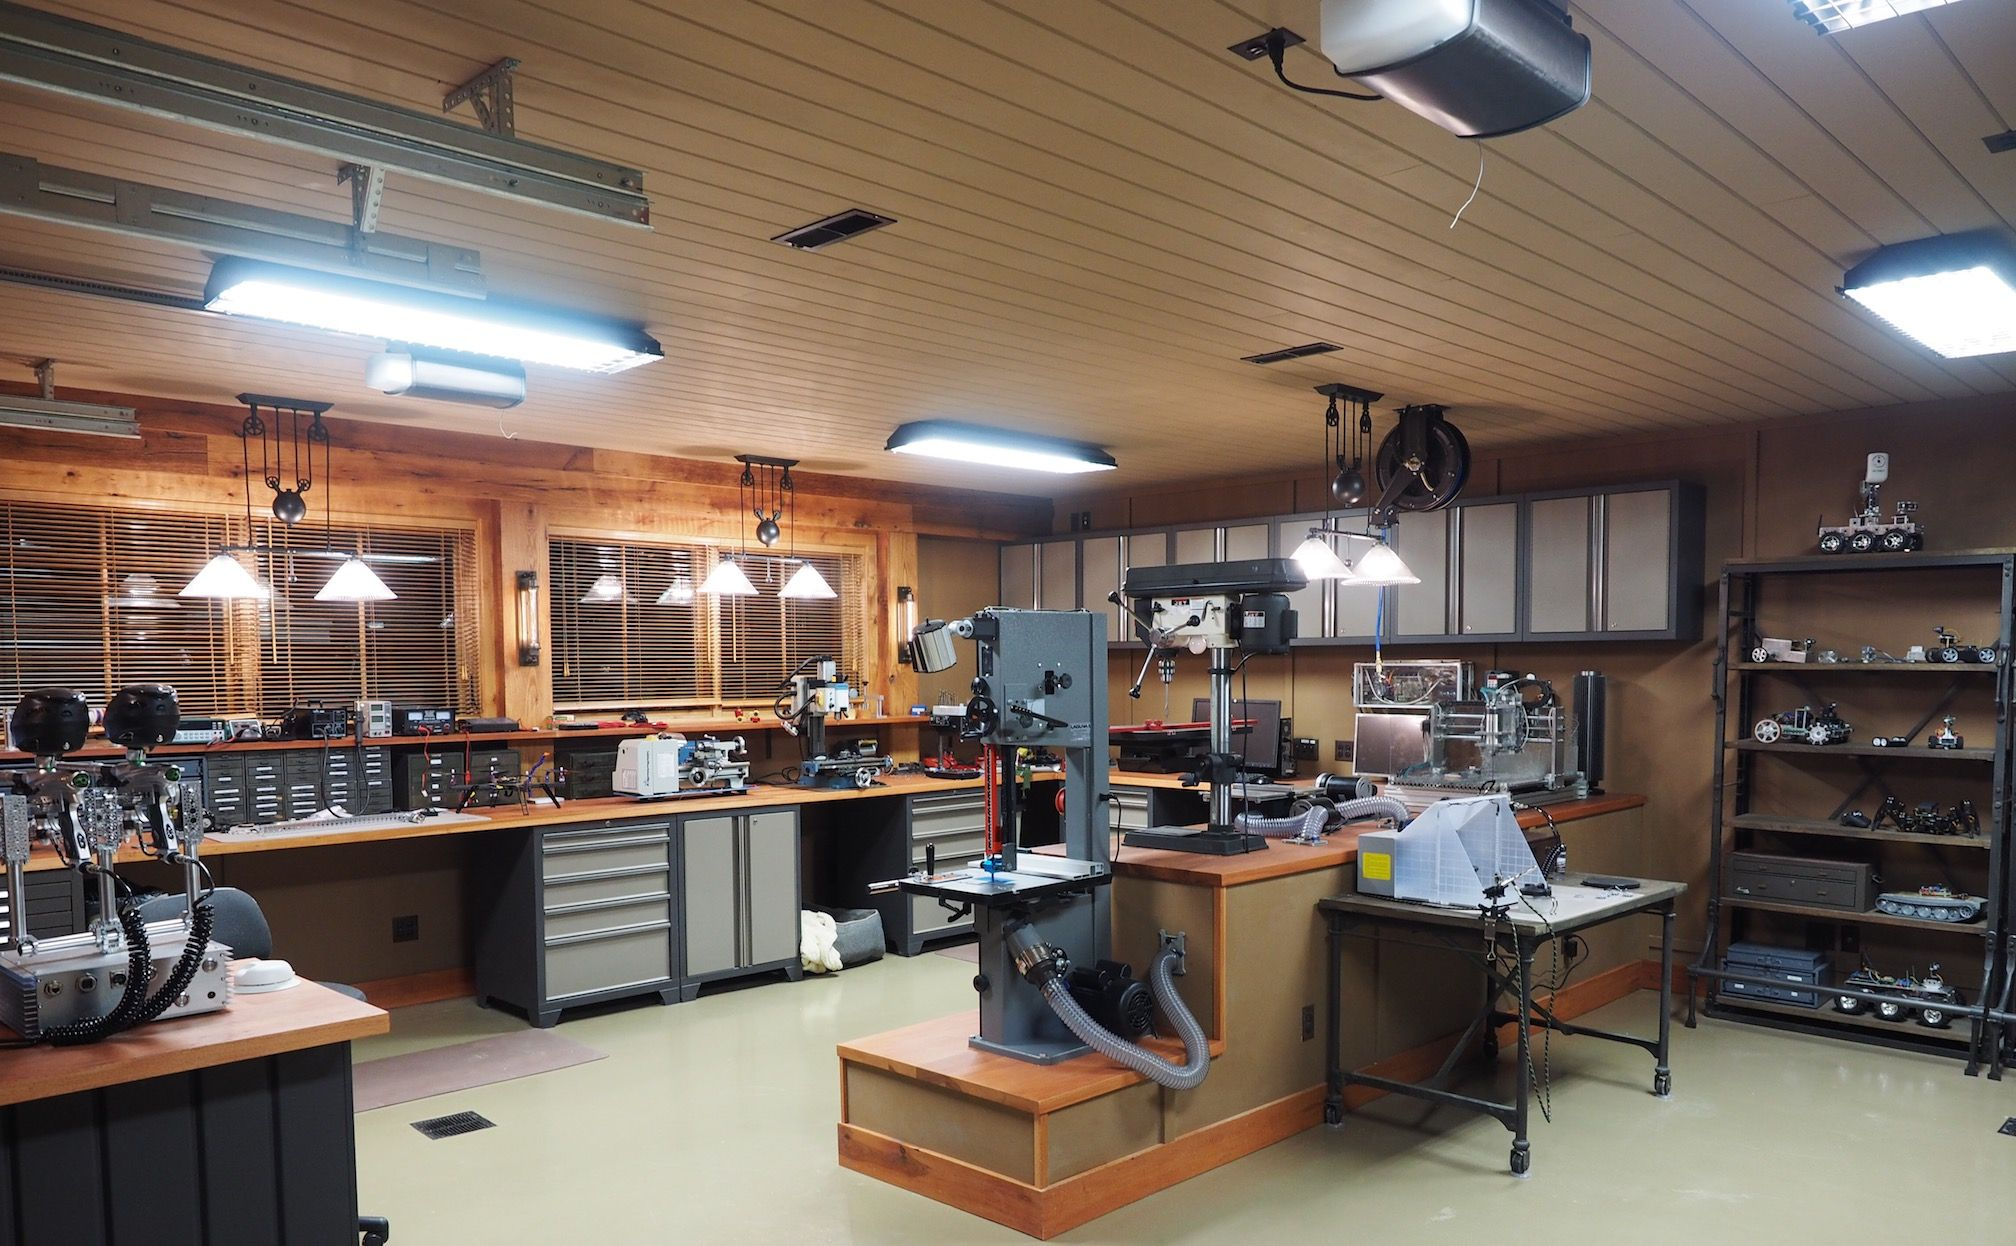 Workshop Tool Photos Categories Beatty Robotics Garage